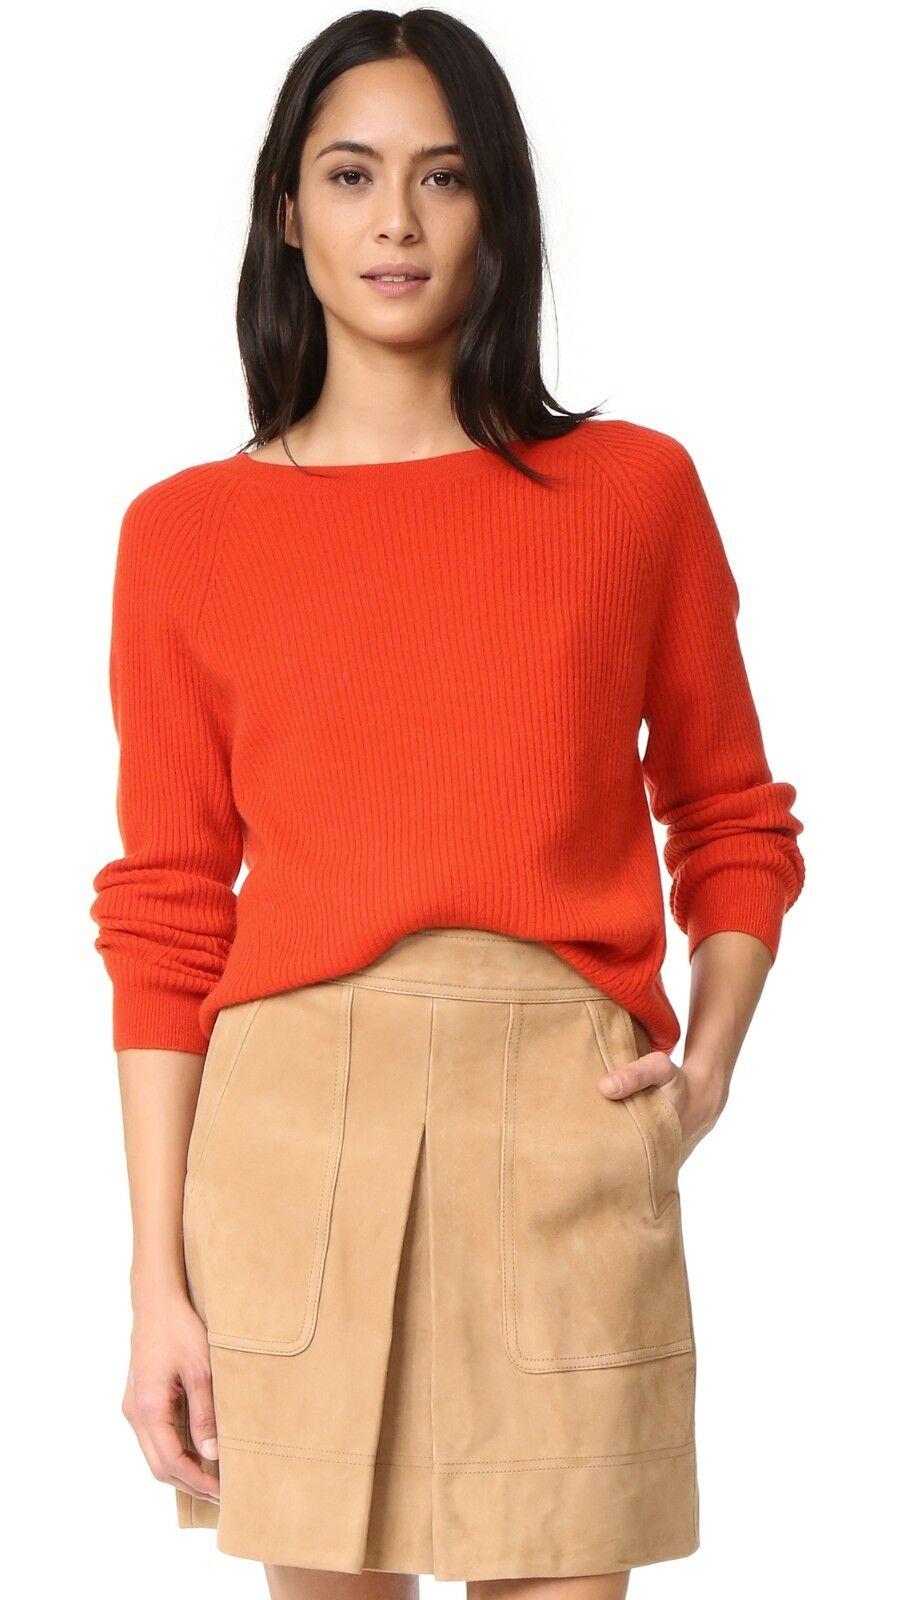 NWT Vince Raglan Ribbed Cashmere Crew Neck Sweater Orange Sunrise Größe S  320